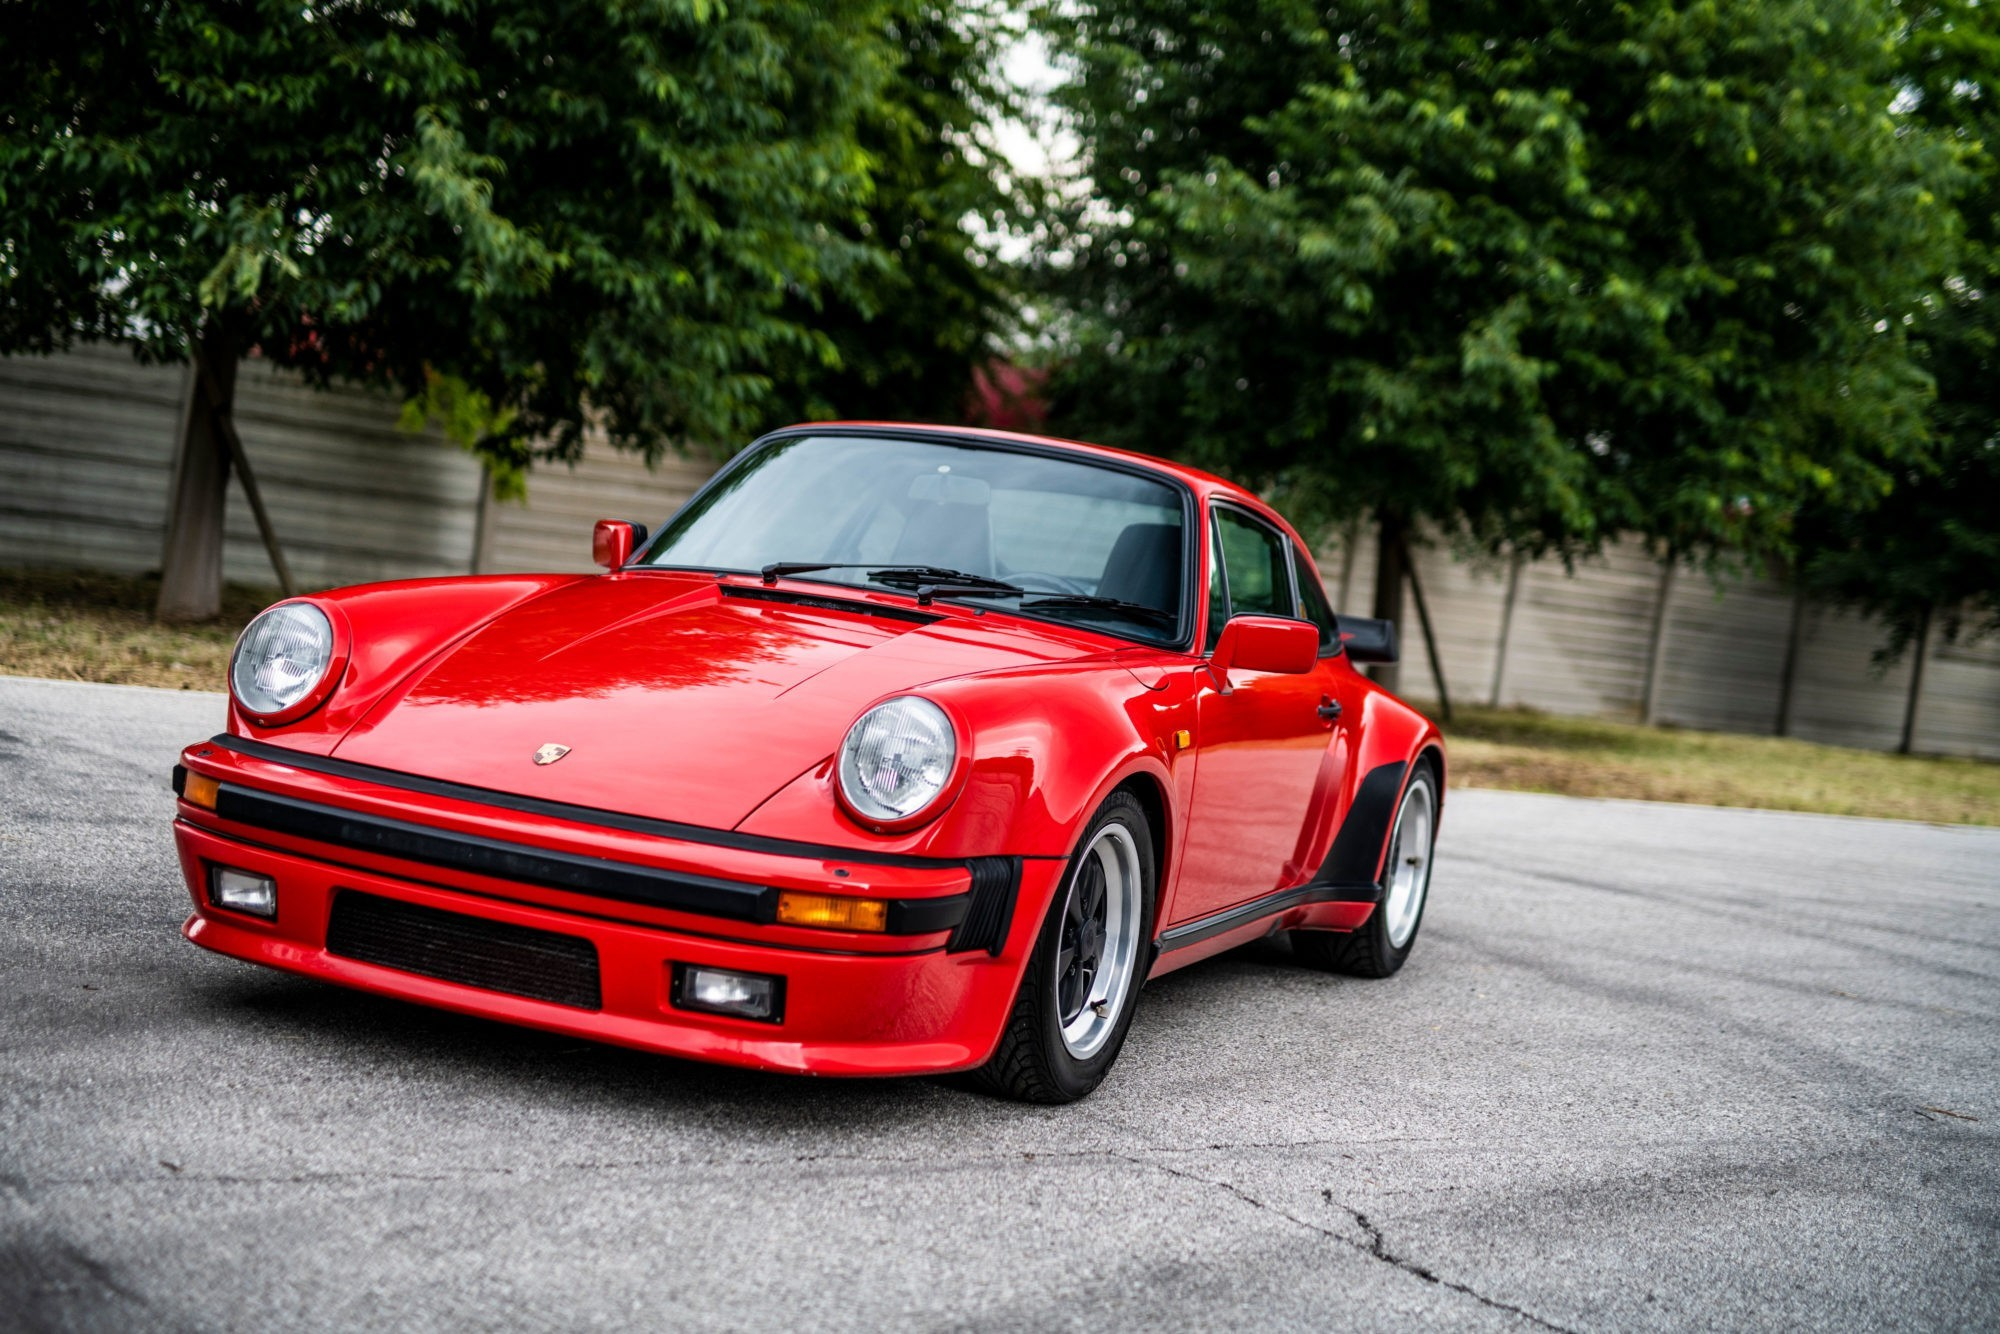 Porsche 911 Turbo 'Group B' 1987